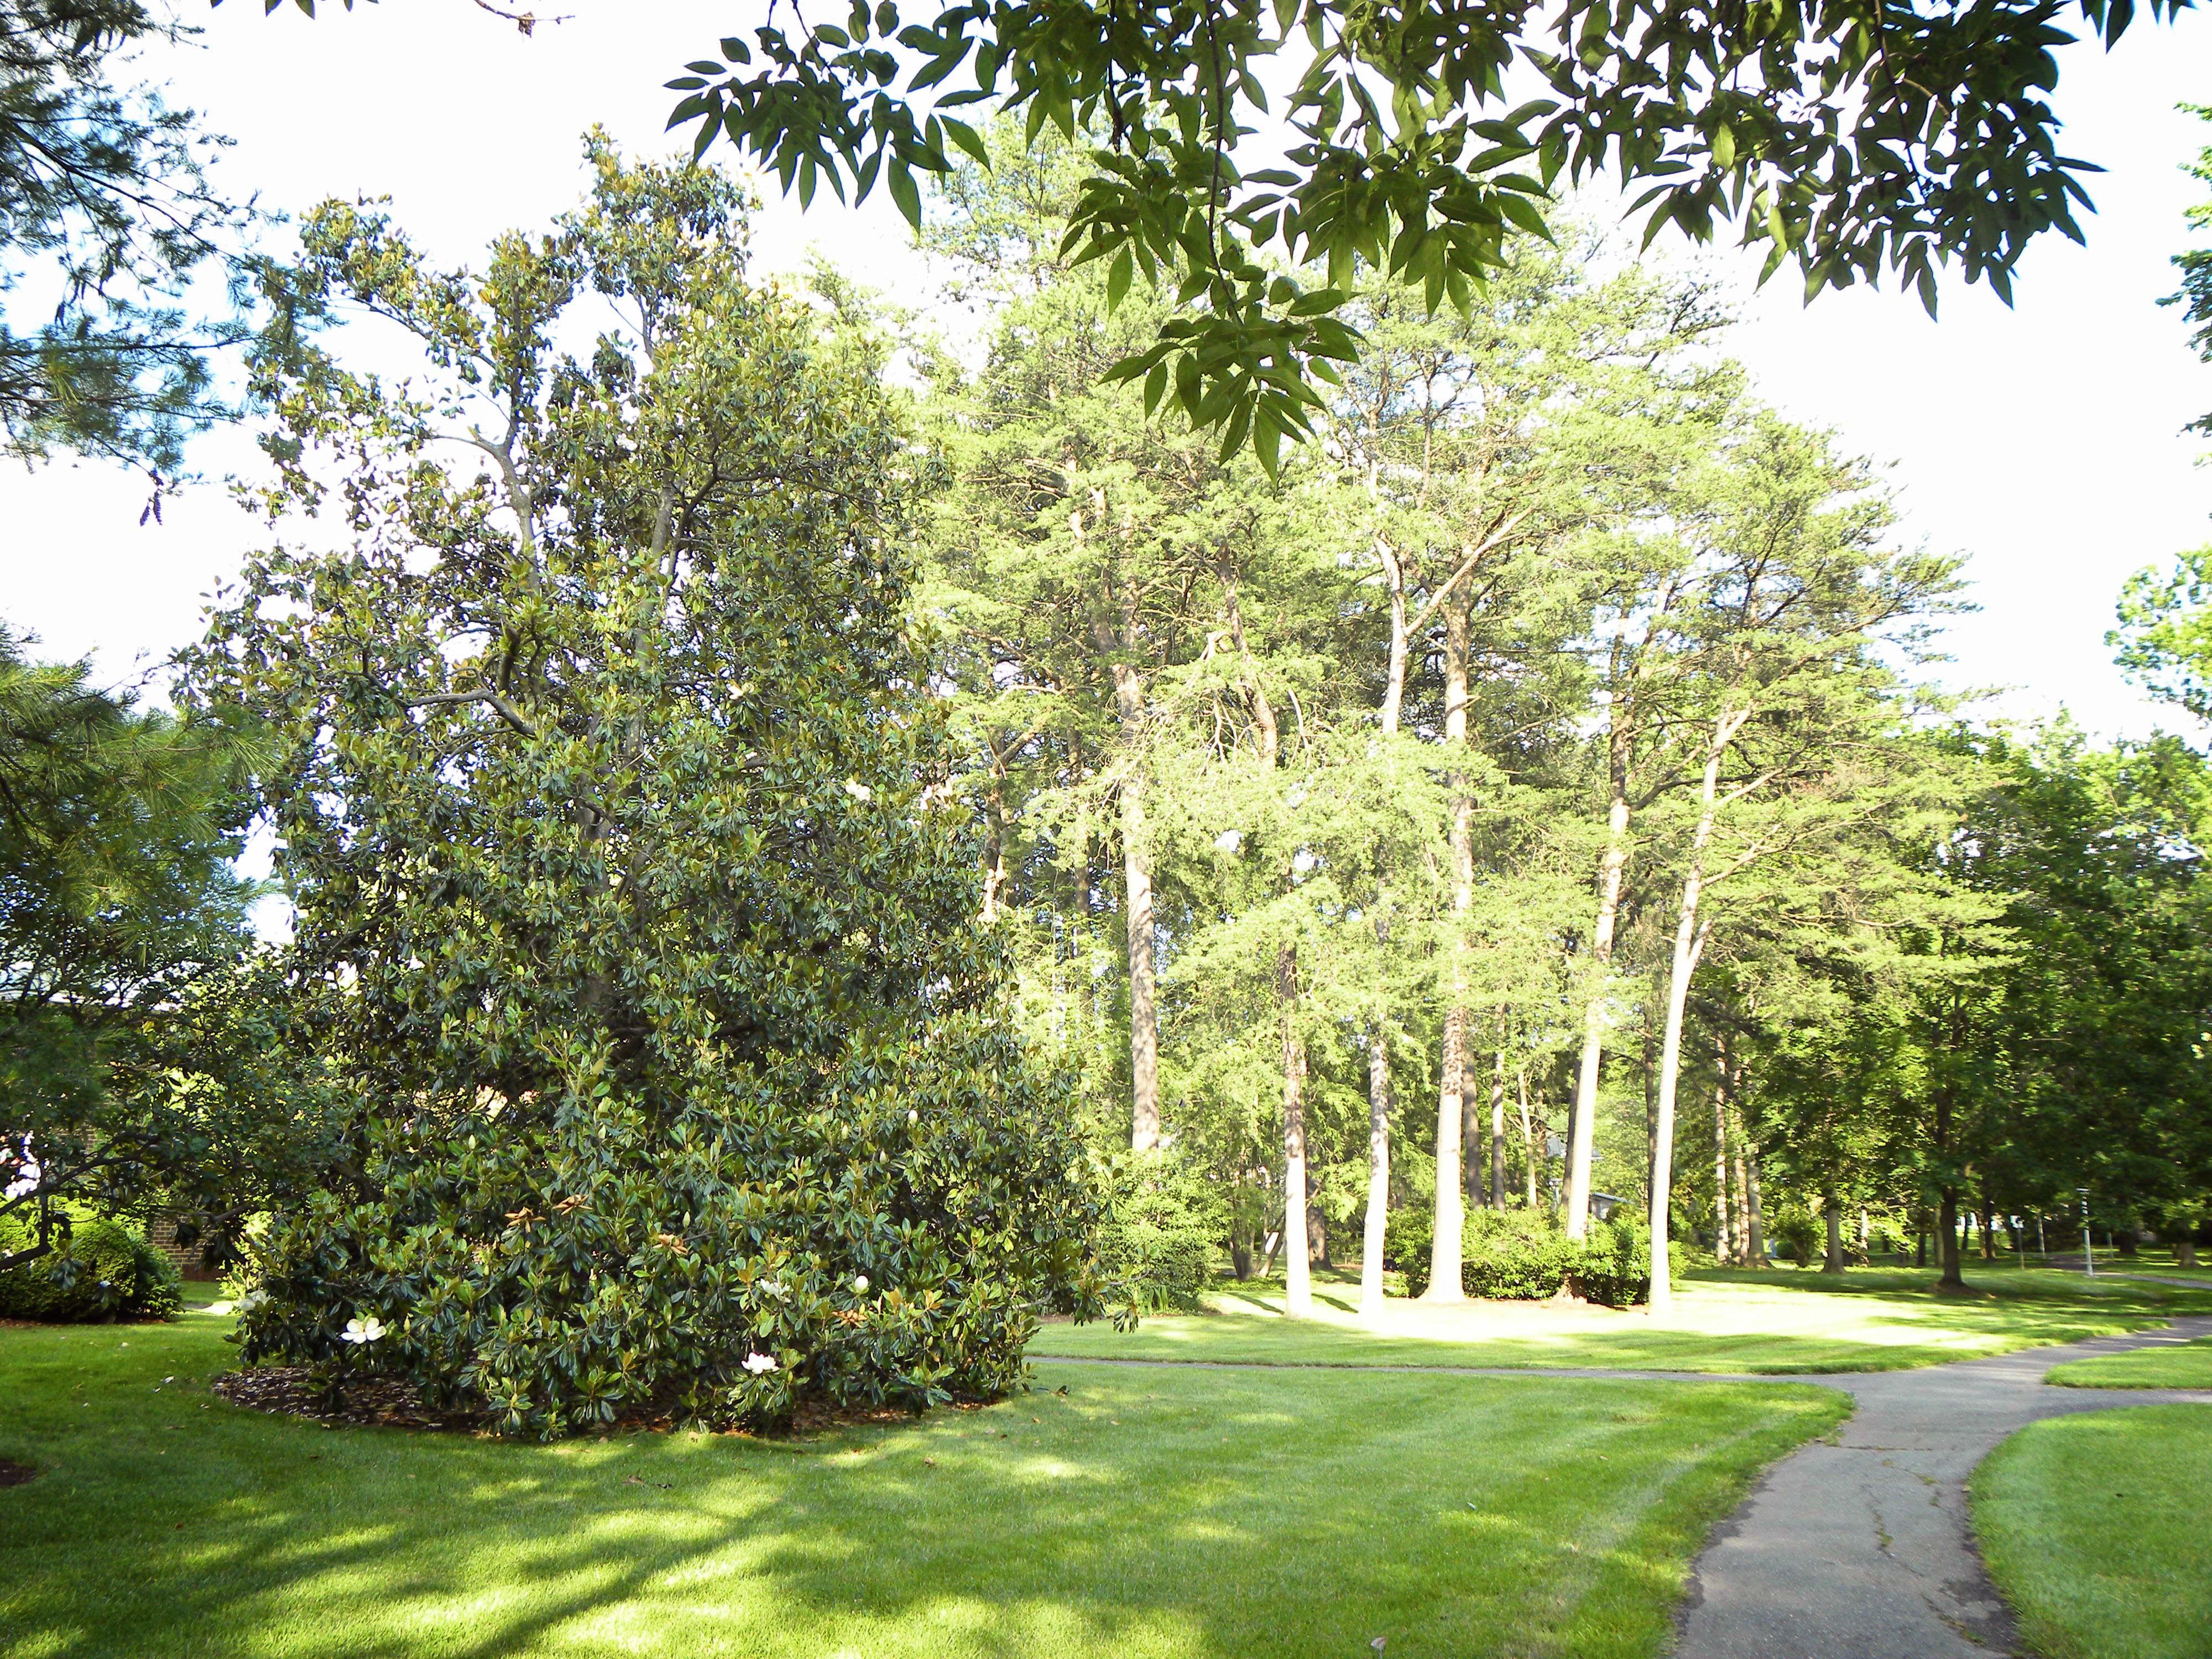 Interesting facts on magnolias morning bray farm for Magnolia tree